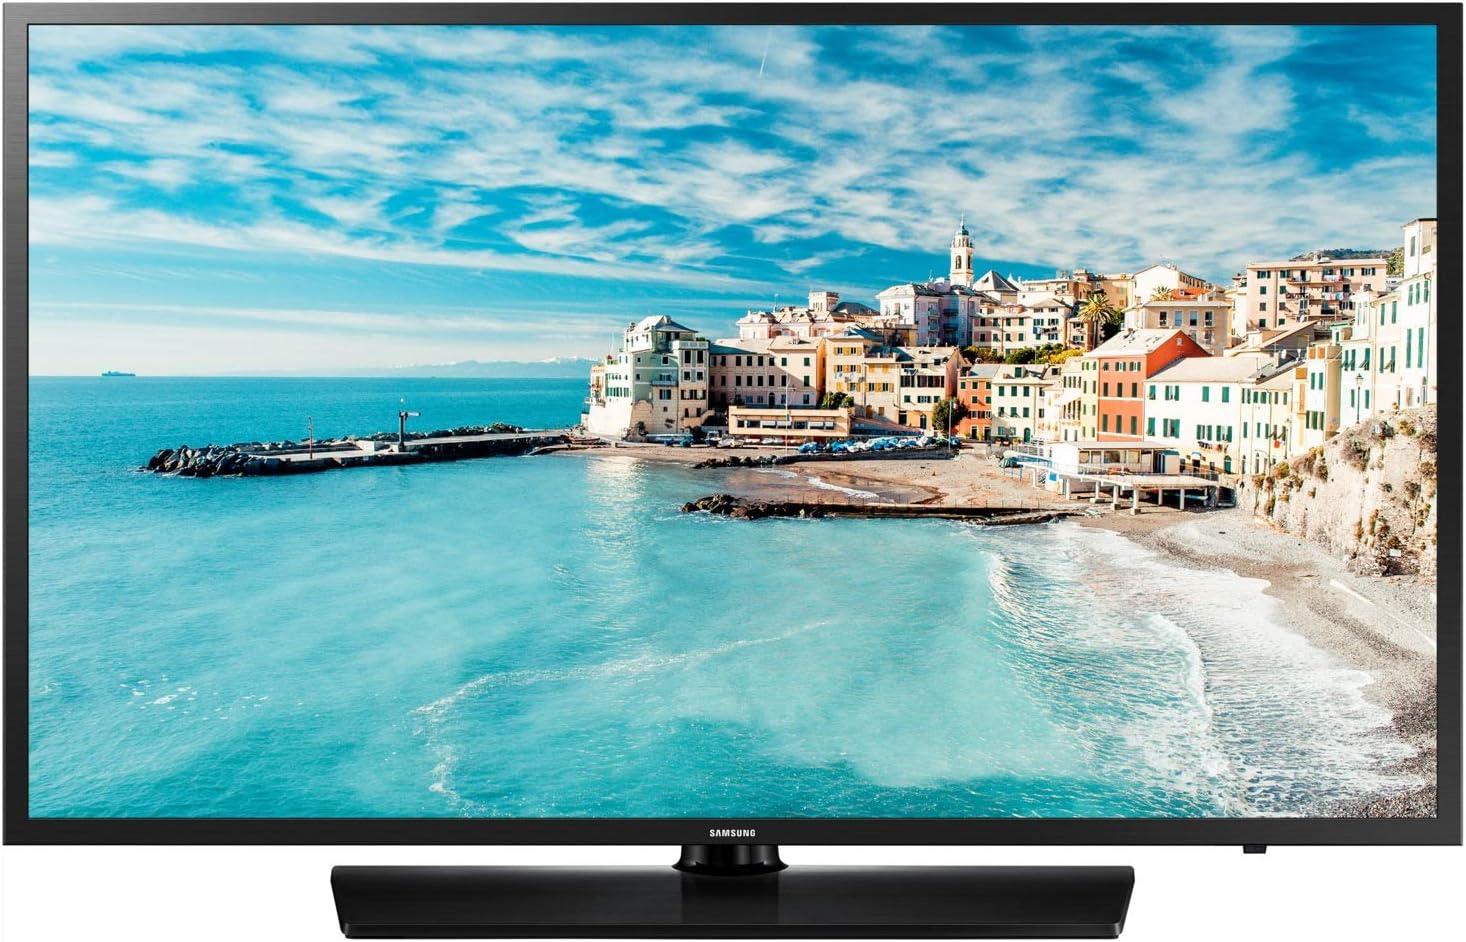 Samsung TV Hospitality 49: Samsung: Amazon.es: Electrónica